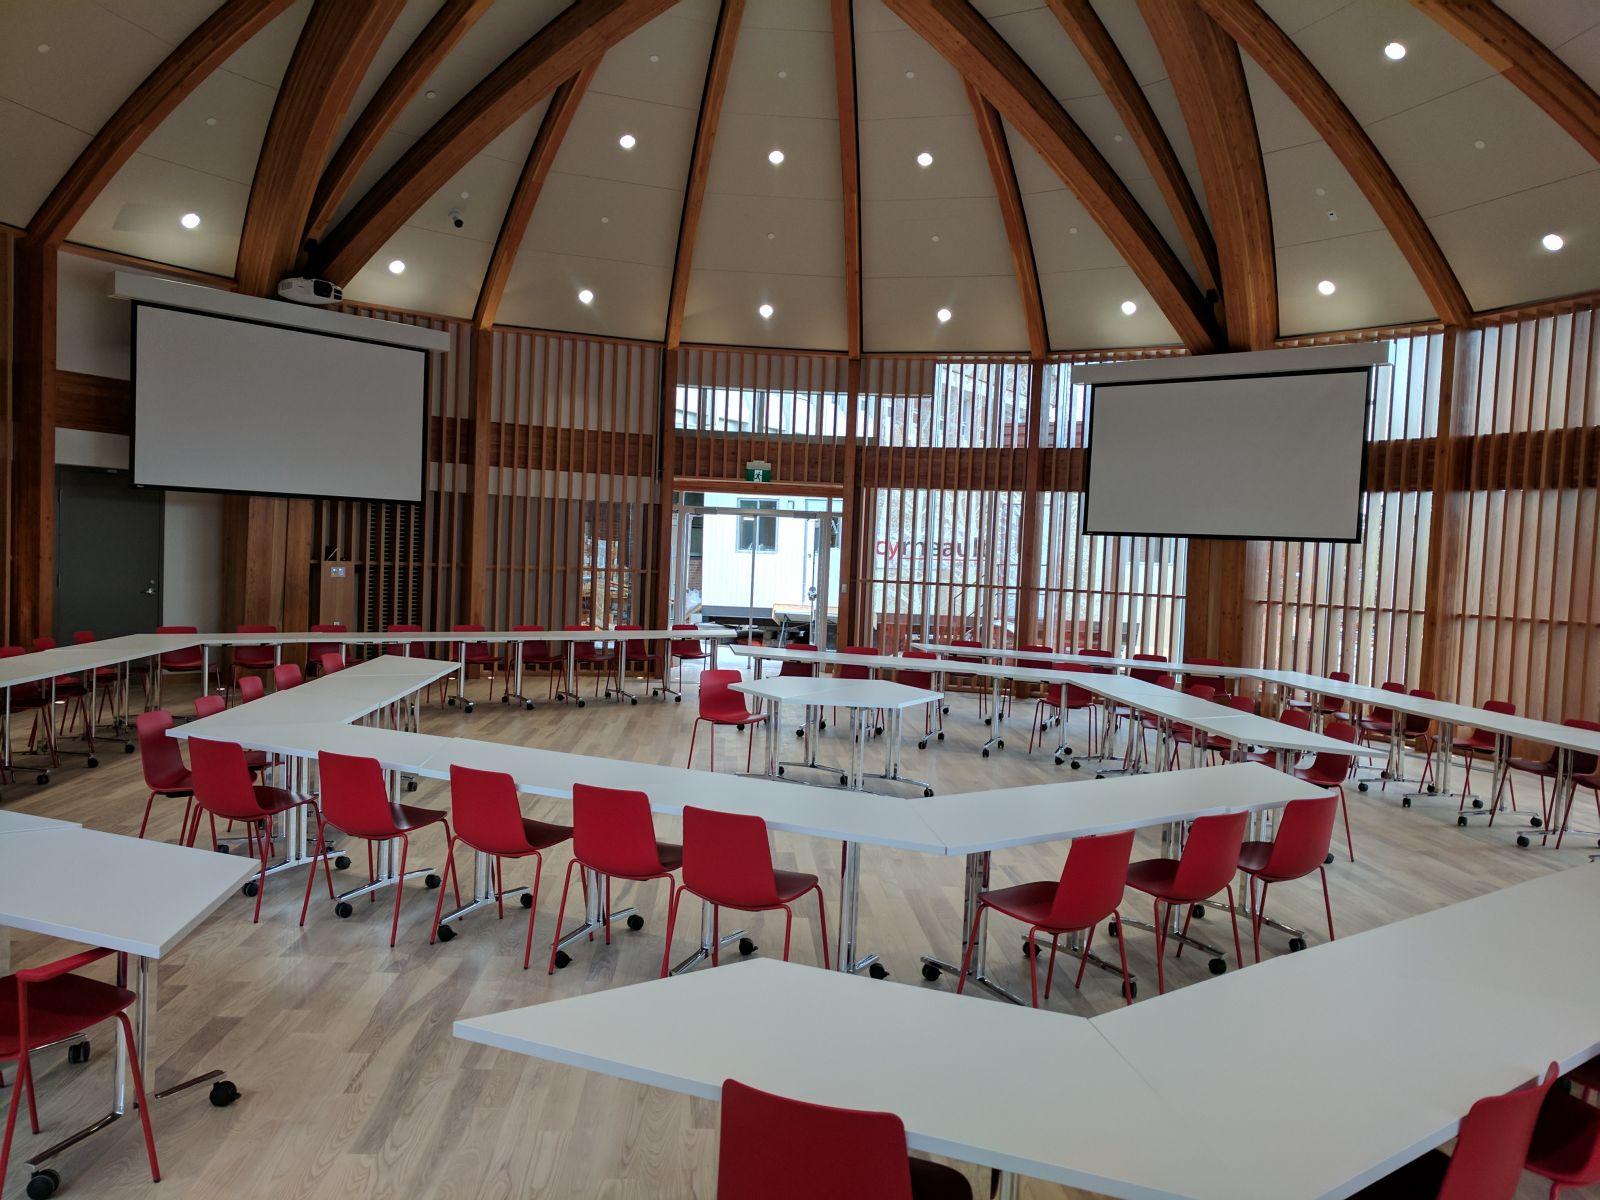 ISLC Round Room